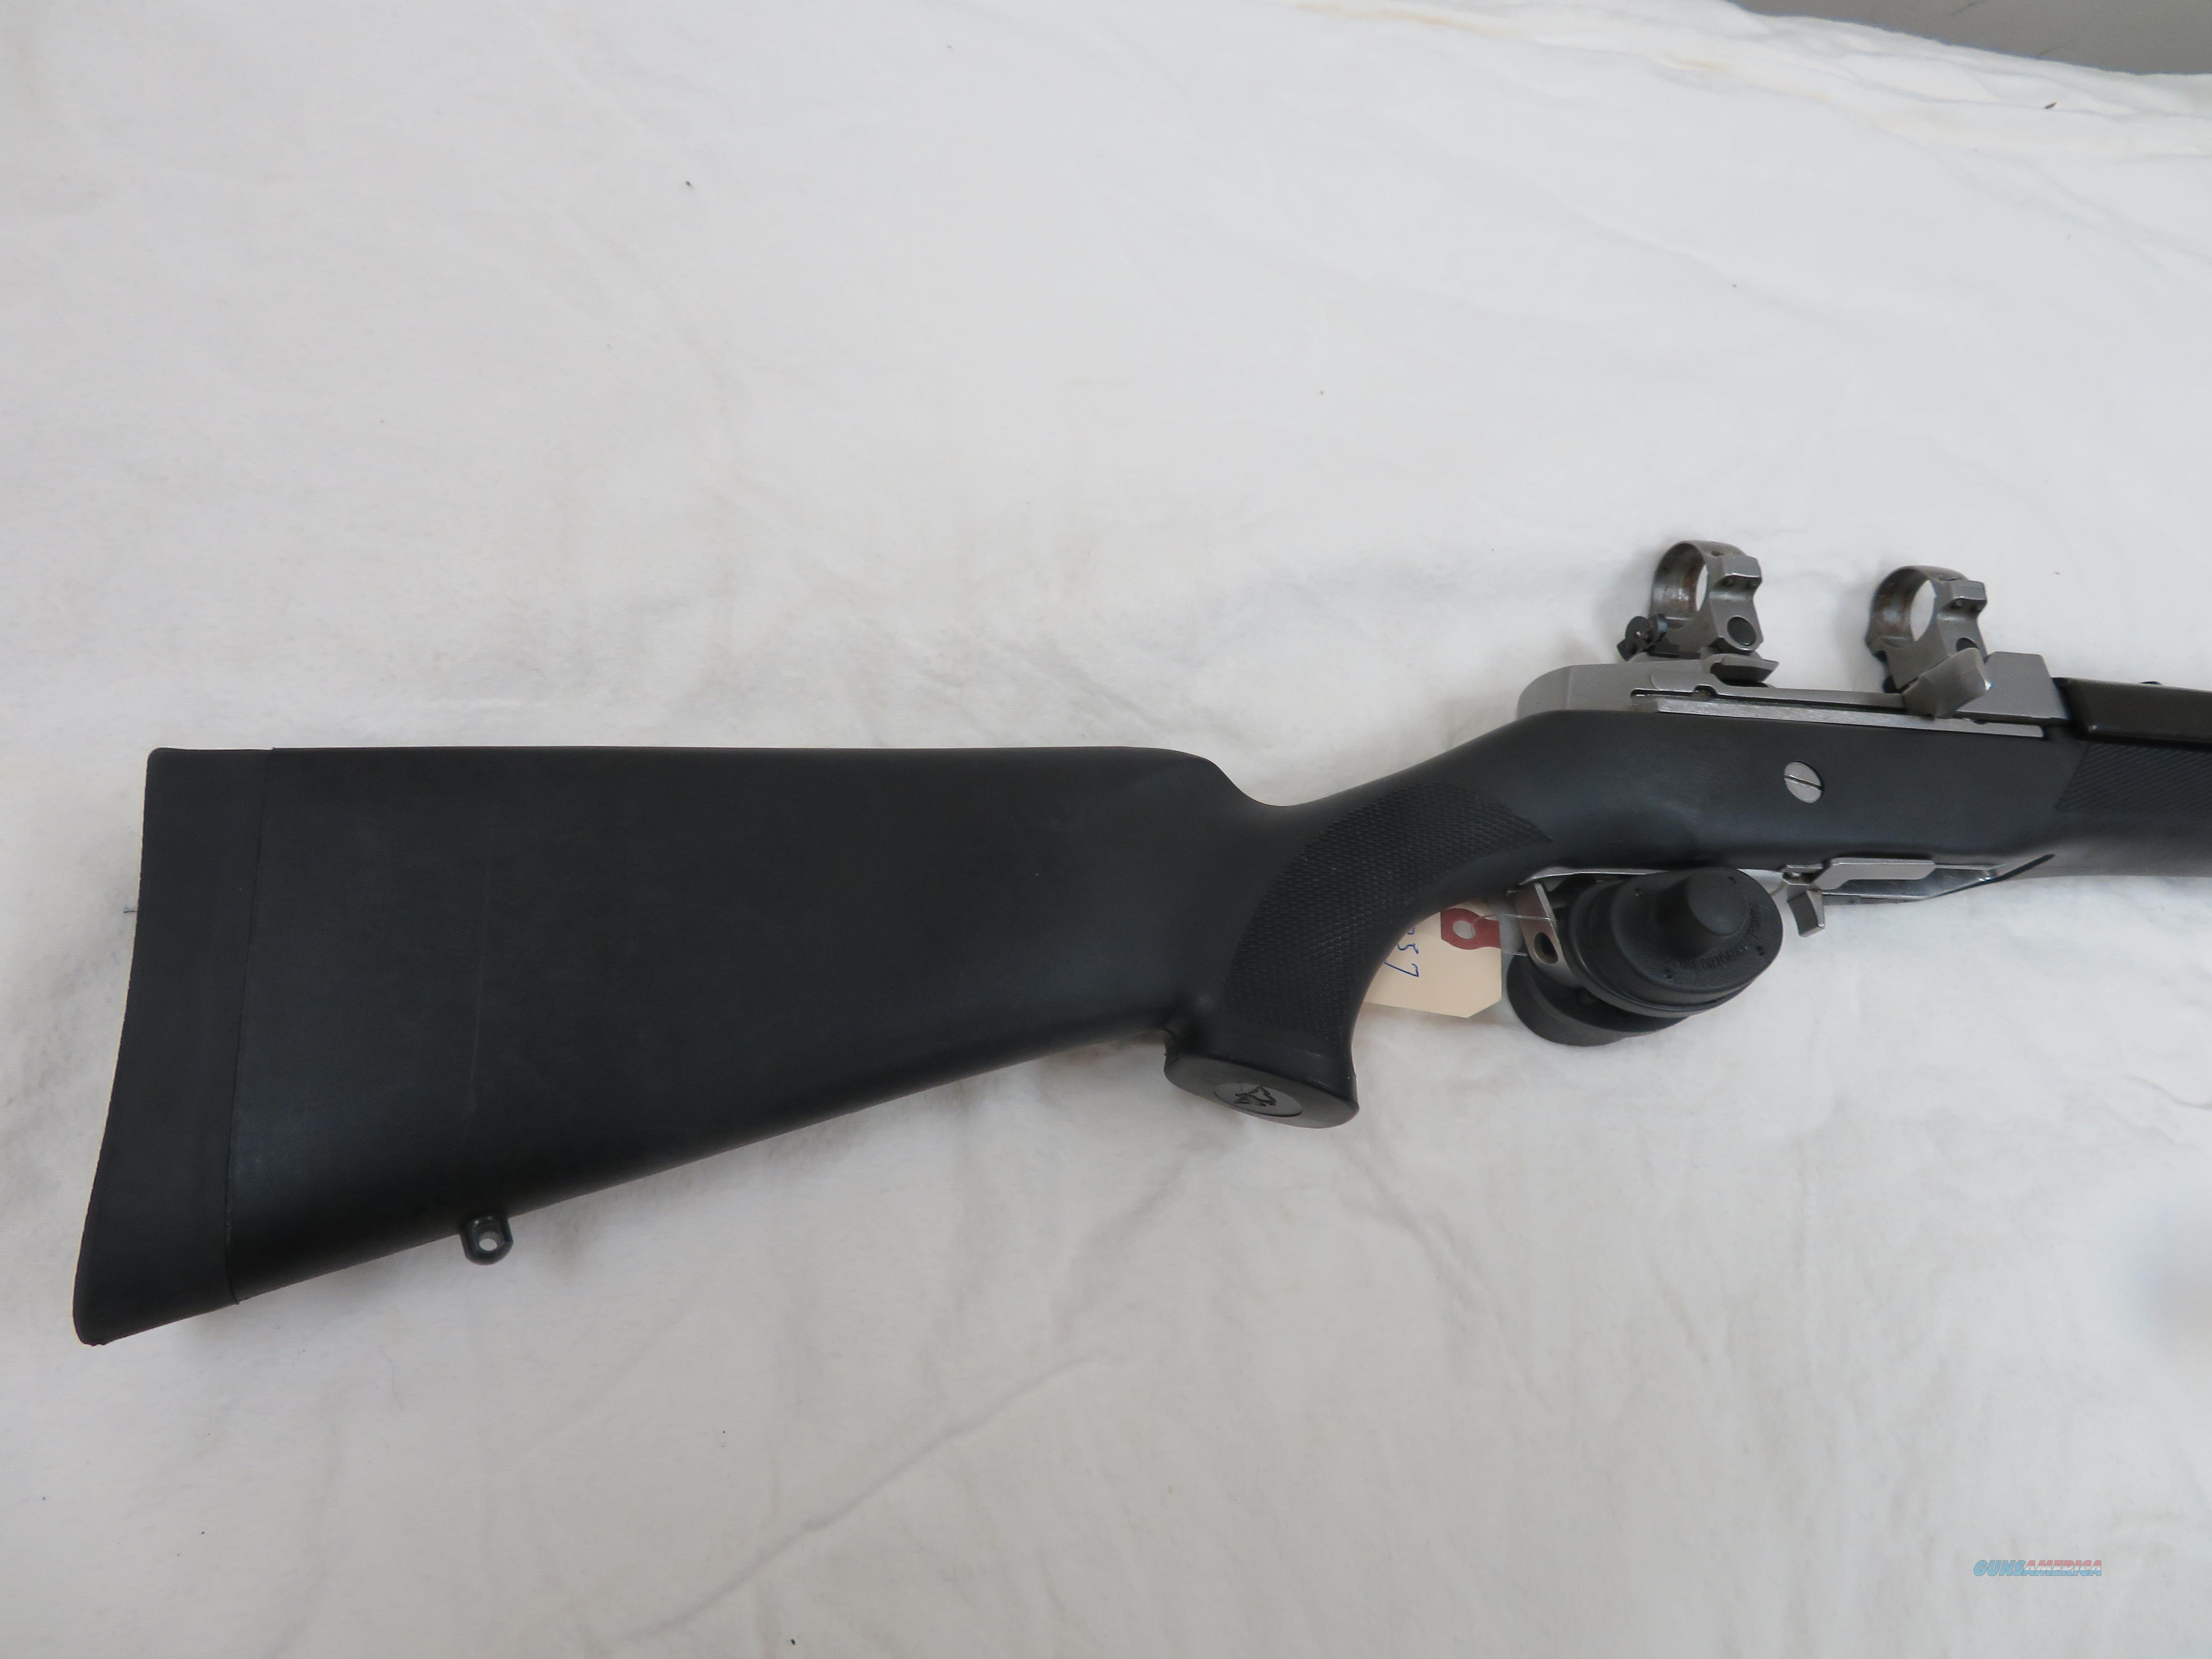 RUGER MINI 14 RANCH  Guns > Rifles > Ruger Rifles > Mini-14 Type